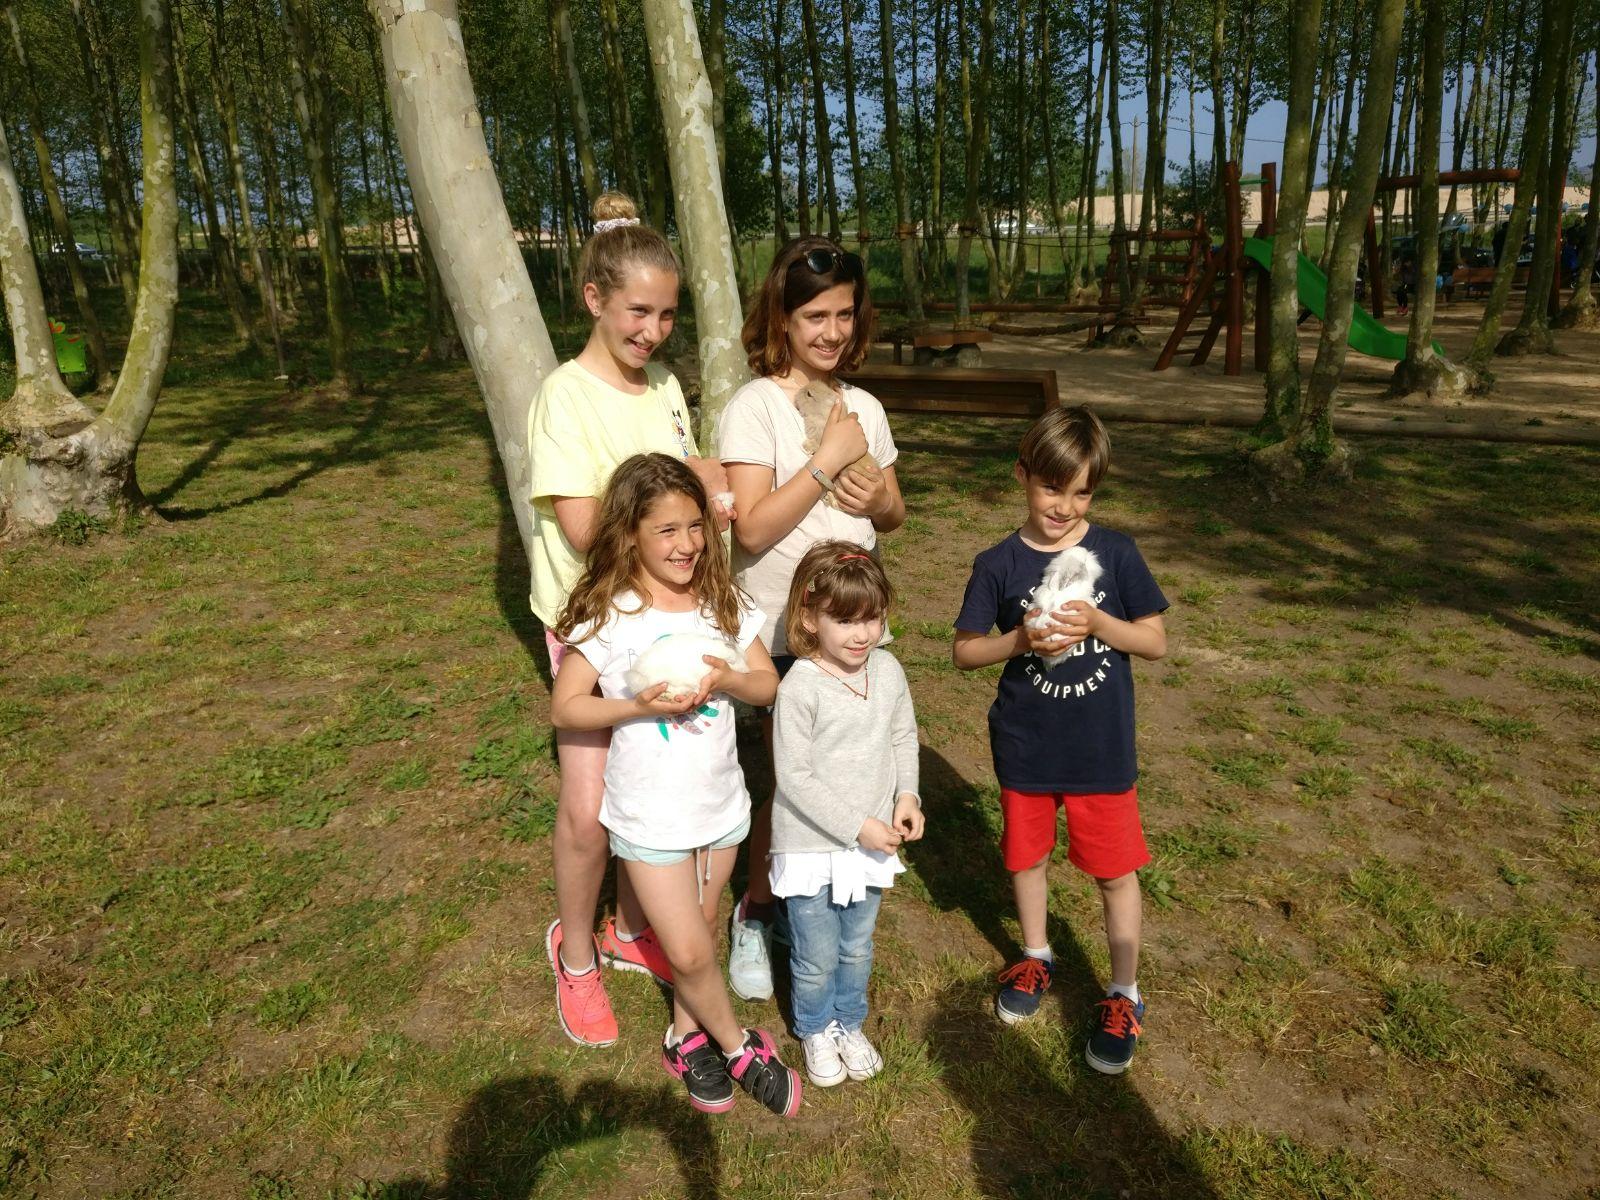 foto grup nens ensenyant conills picnic les 3 flors